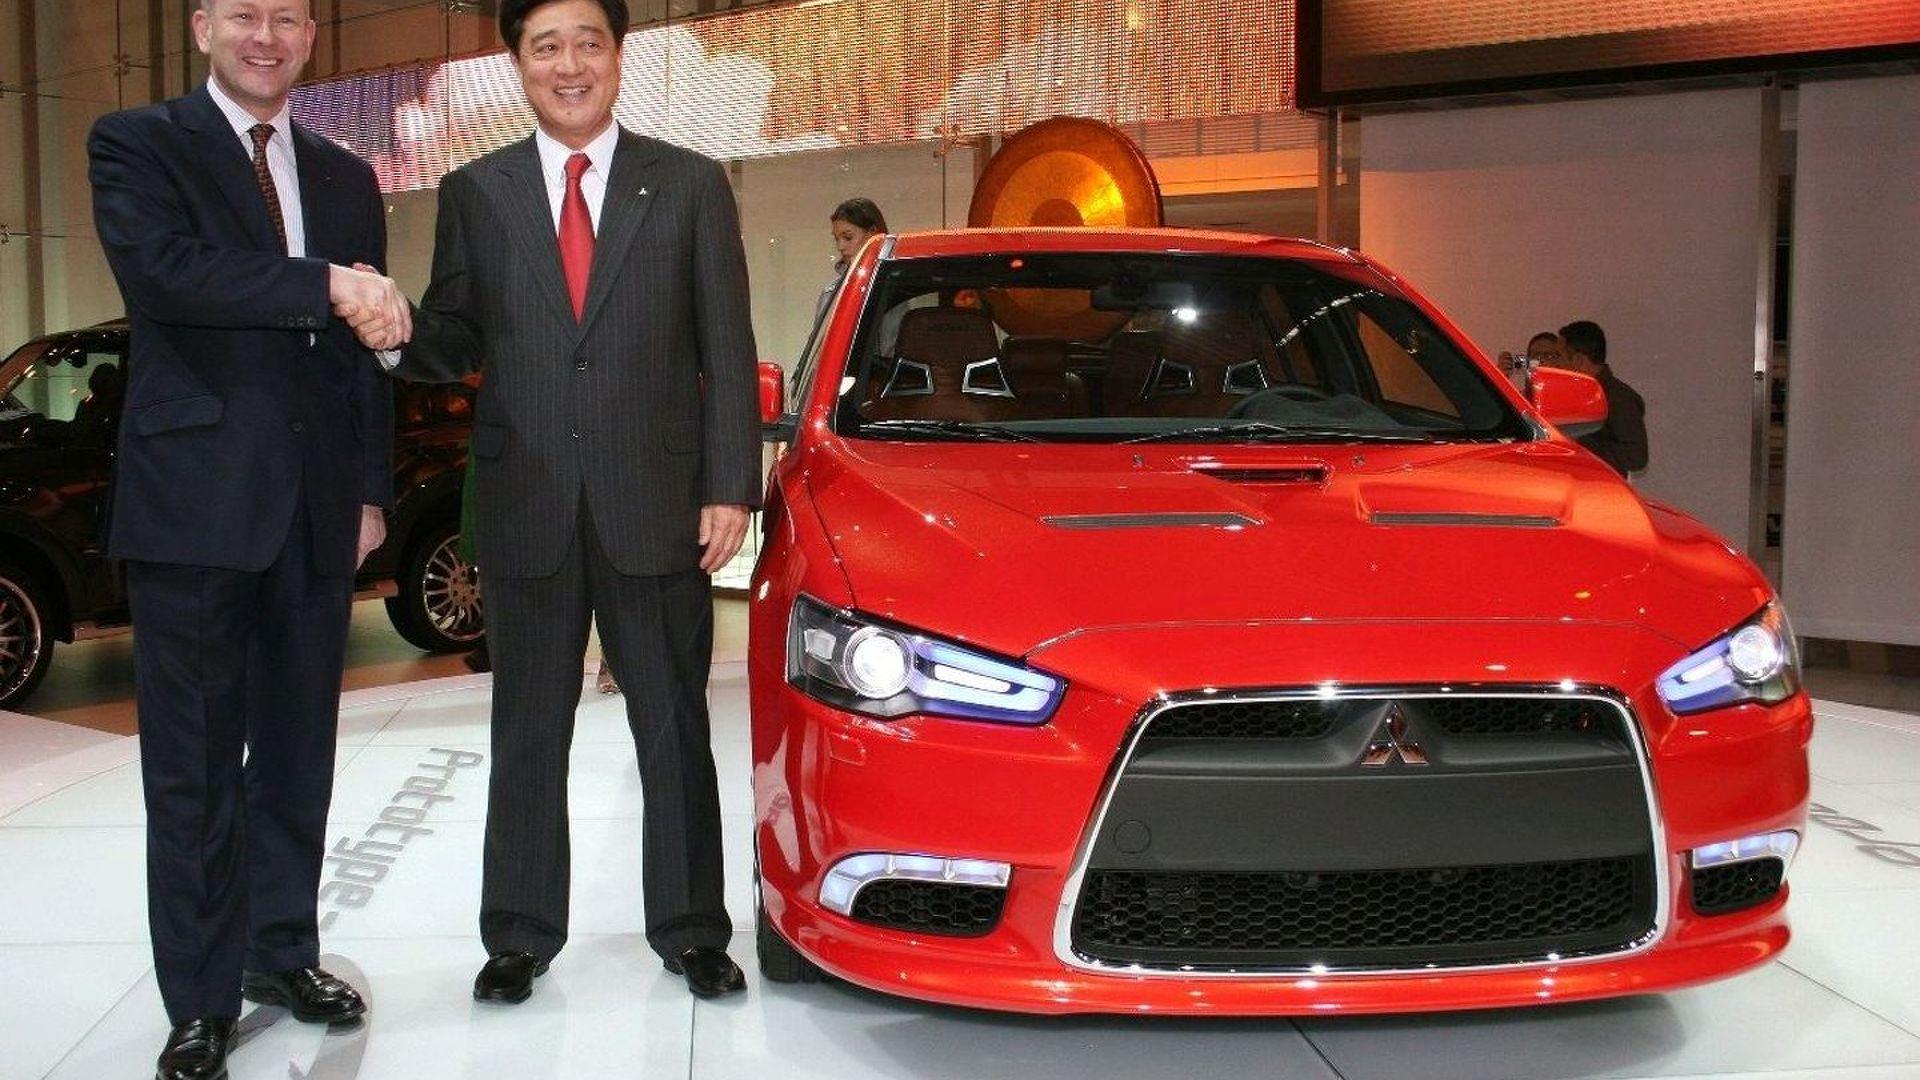 Mitsubishi Prototype S unveiled at Geneva